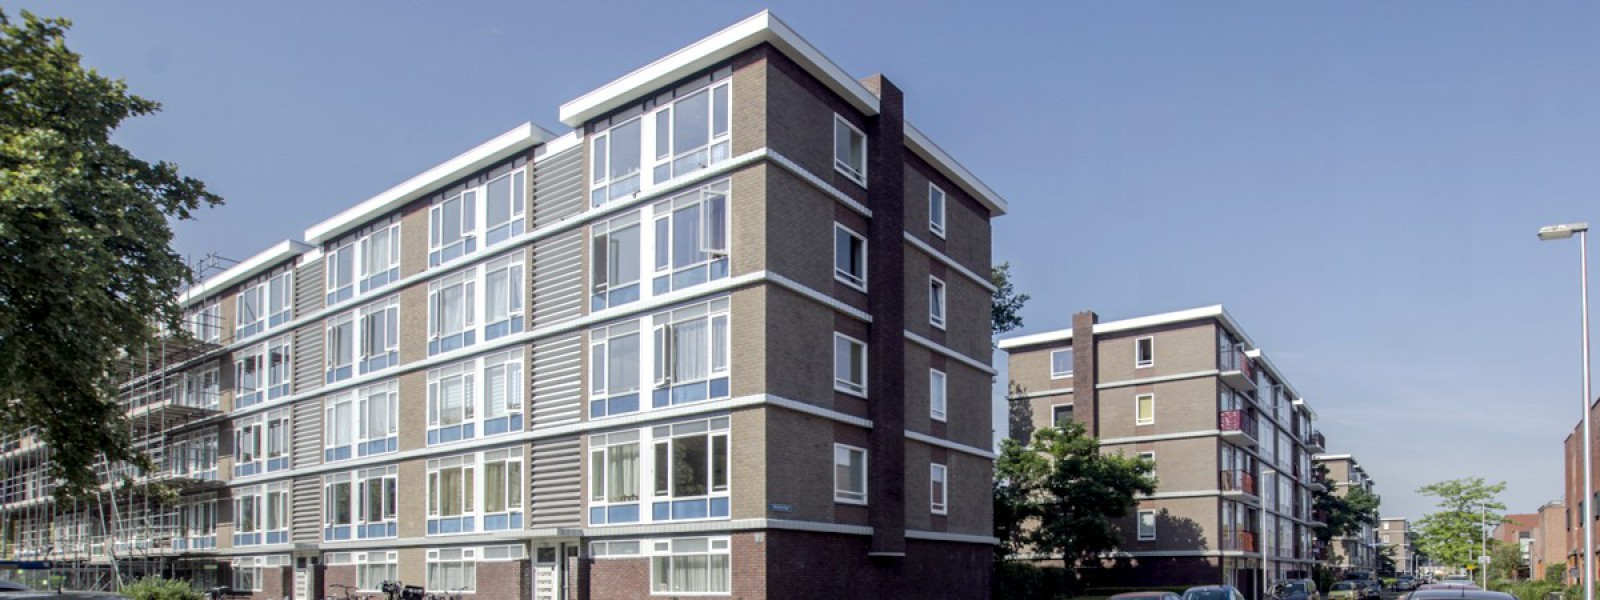 116_Rietveldwoningen Utrecht_